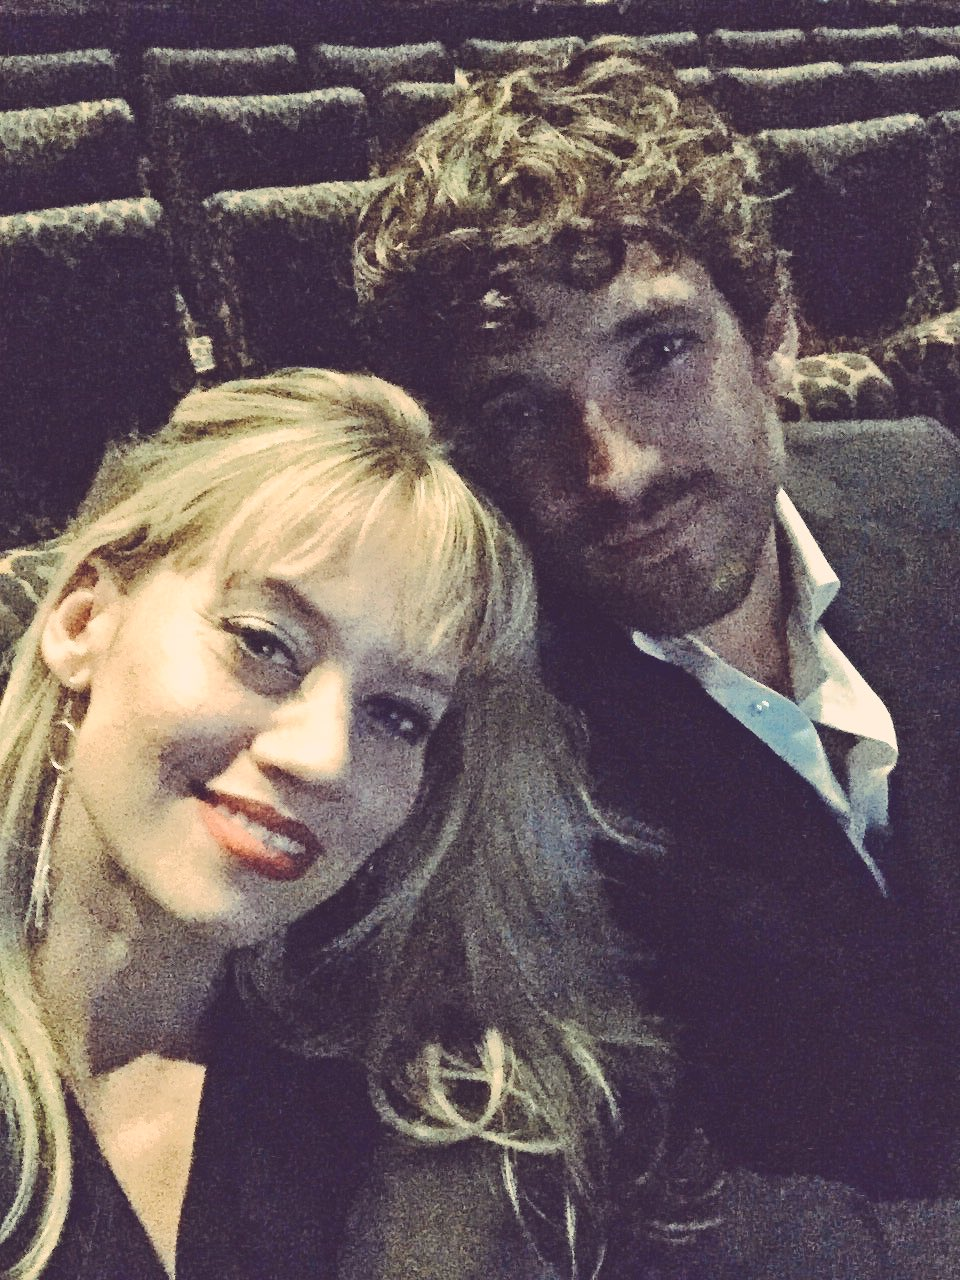 #BrigitteJones premiere!! Husband makes a cameo! Can't wait!!!! 🙌🏾✨✨❤️❤️❤️ @max_rogers https://t.co/CEqO1iFdBZ